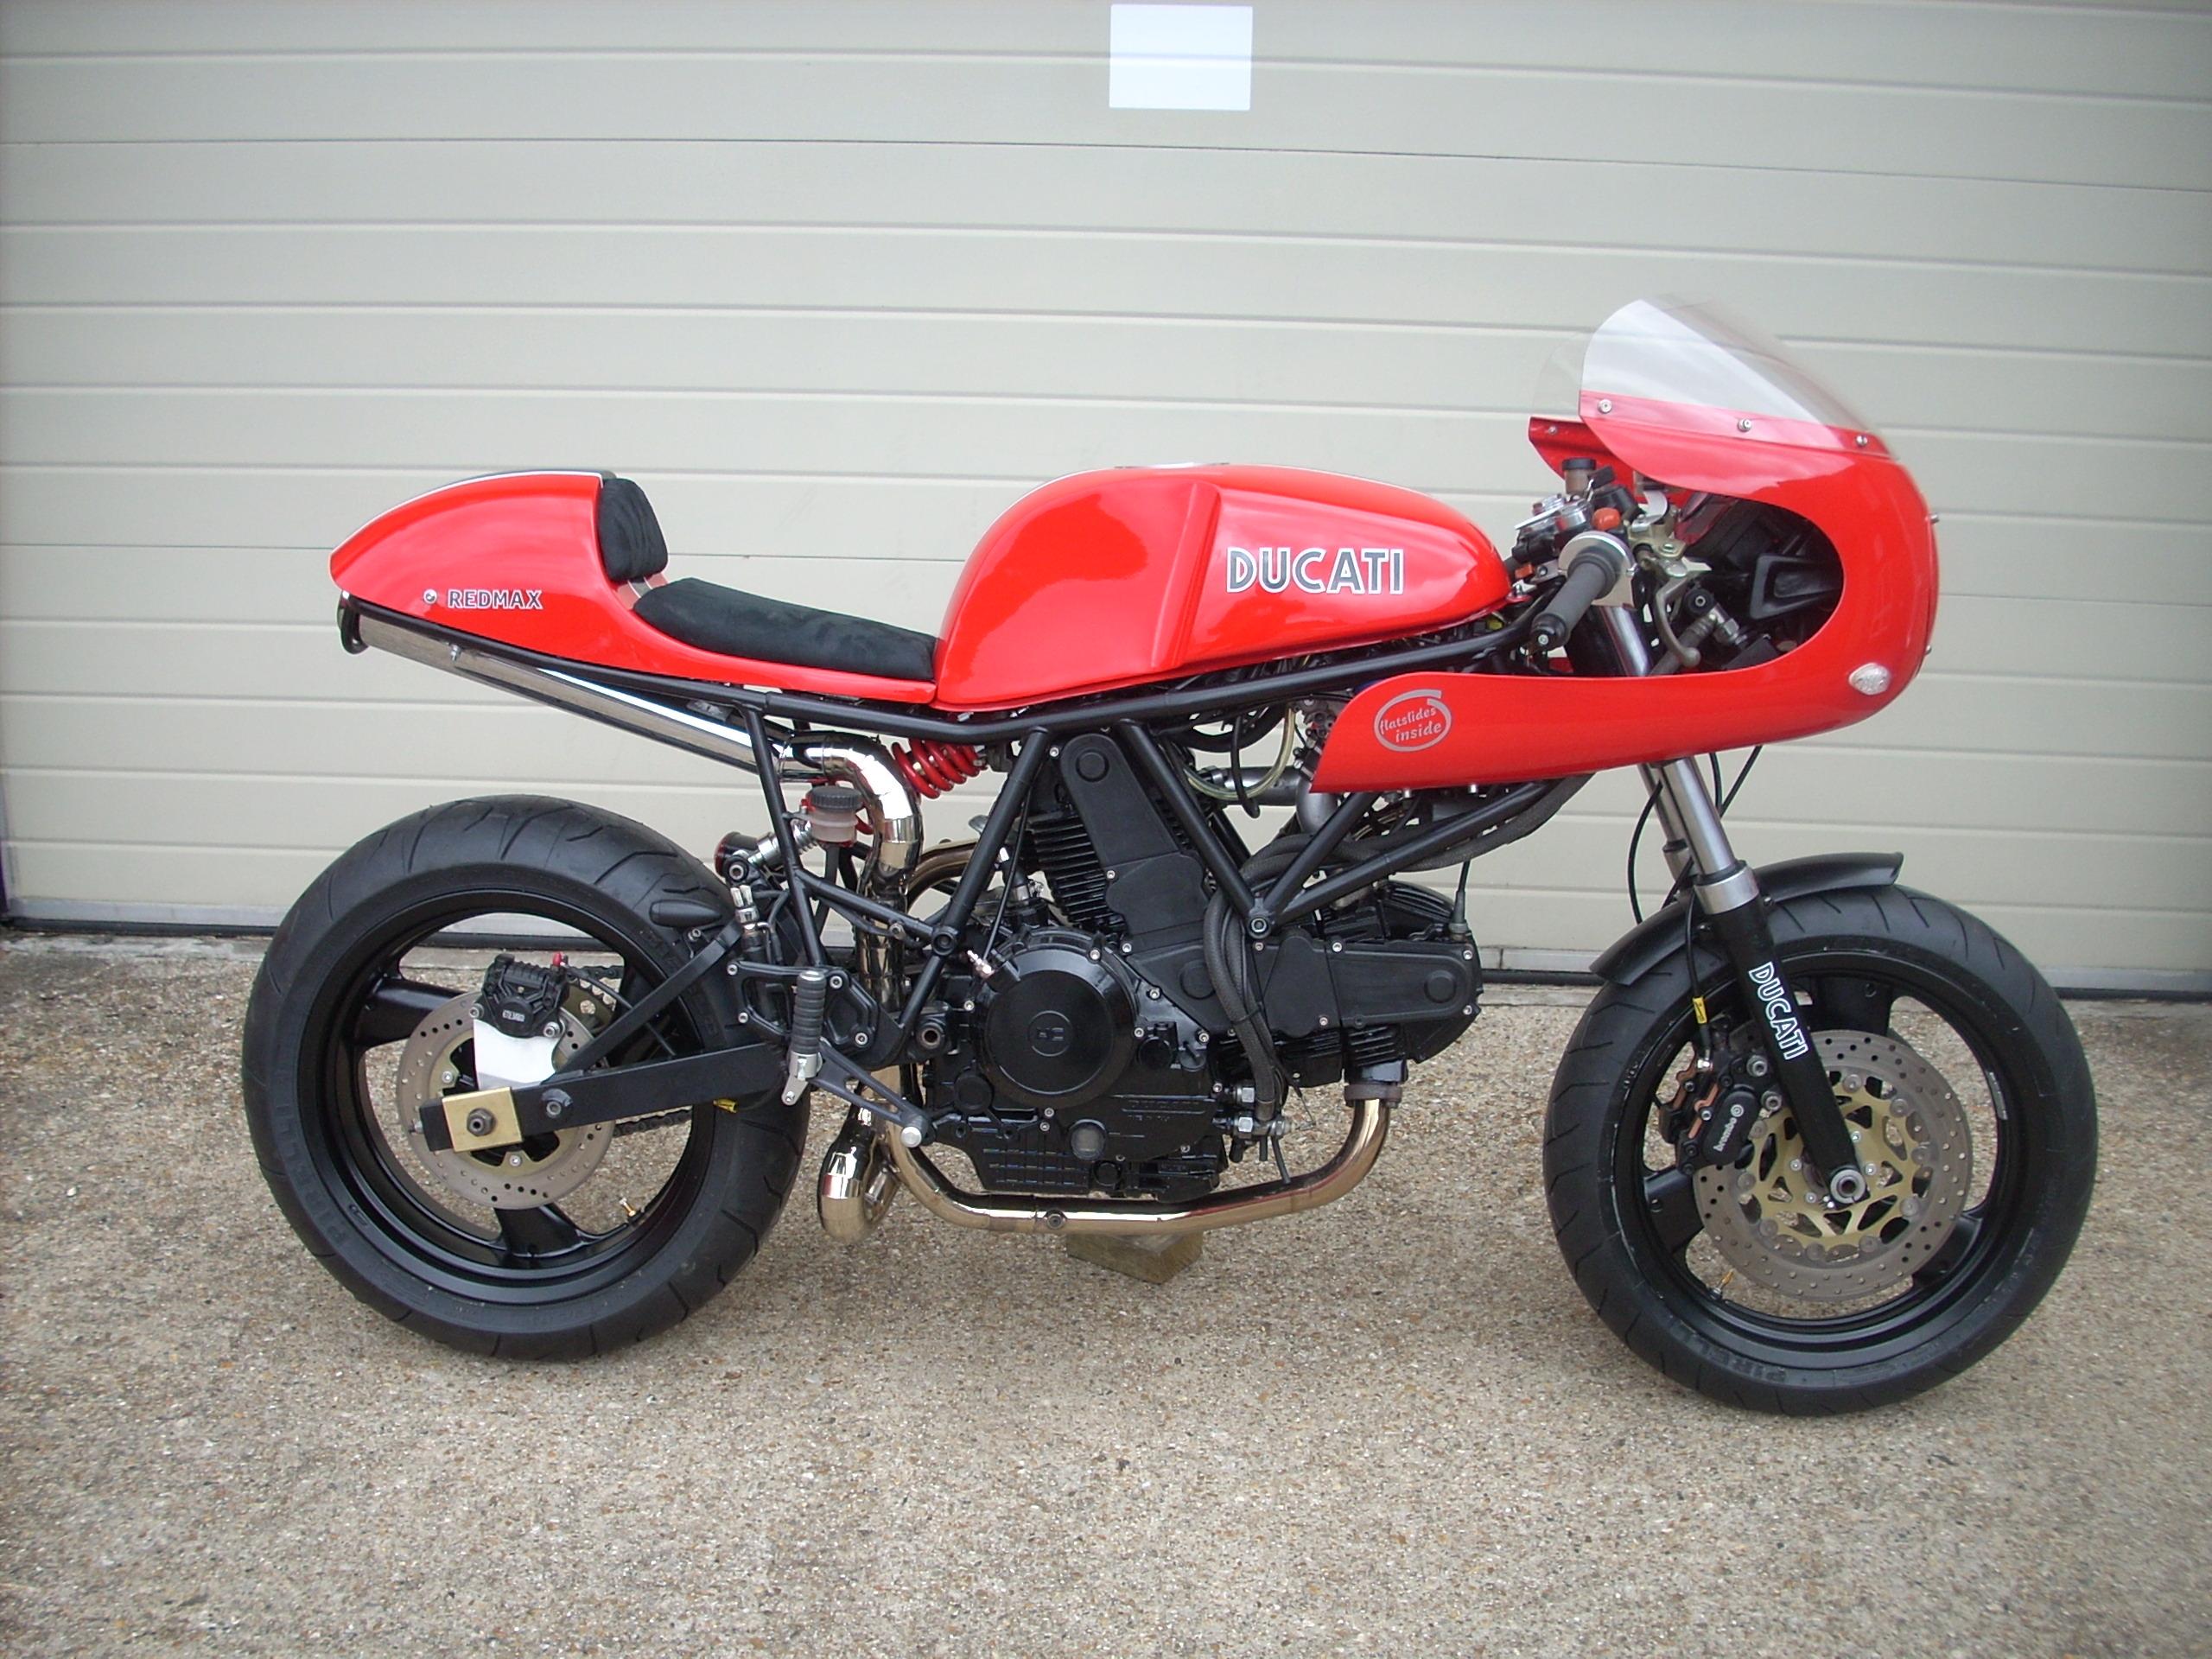 Ducati Multistrada Fairings